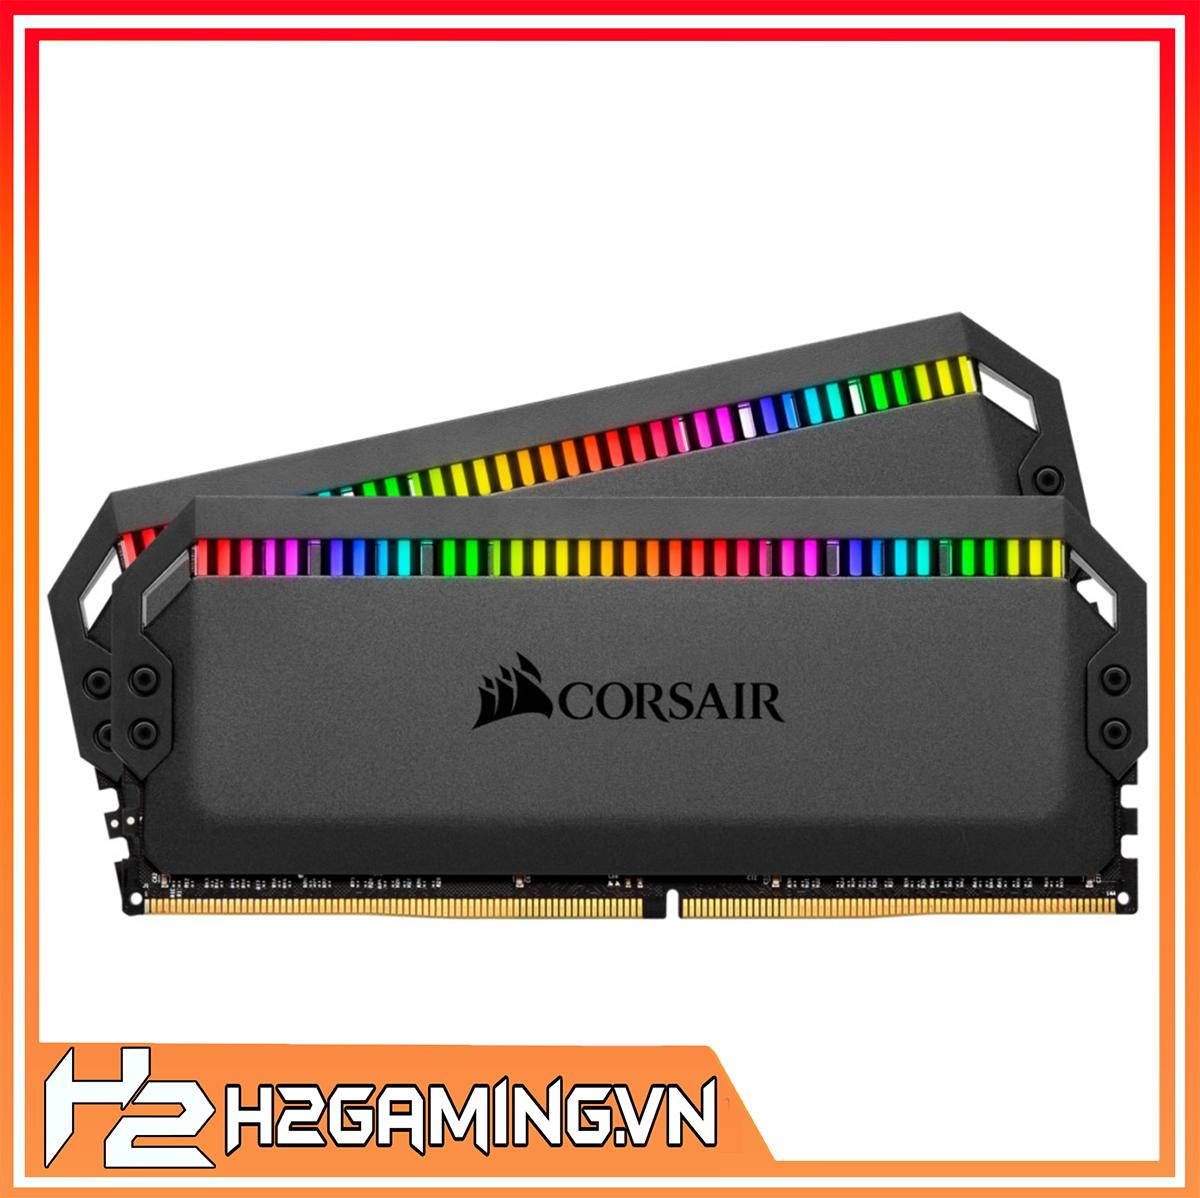 Ram_Desktop_Corsair_Dominator_Platinum_White_RGB_(CMT16GX4M2C3200C16W)_16GB_(2x8G)_DDR4_3200MHz3